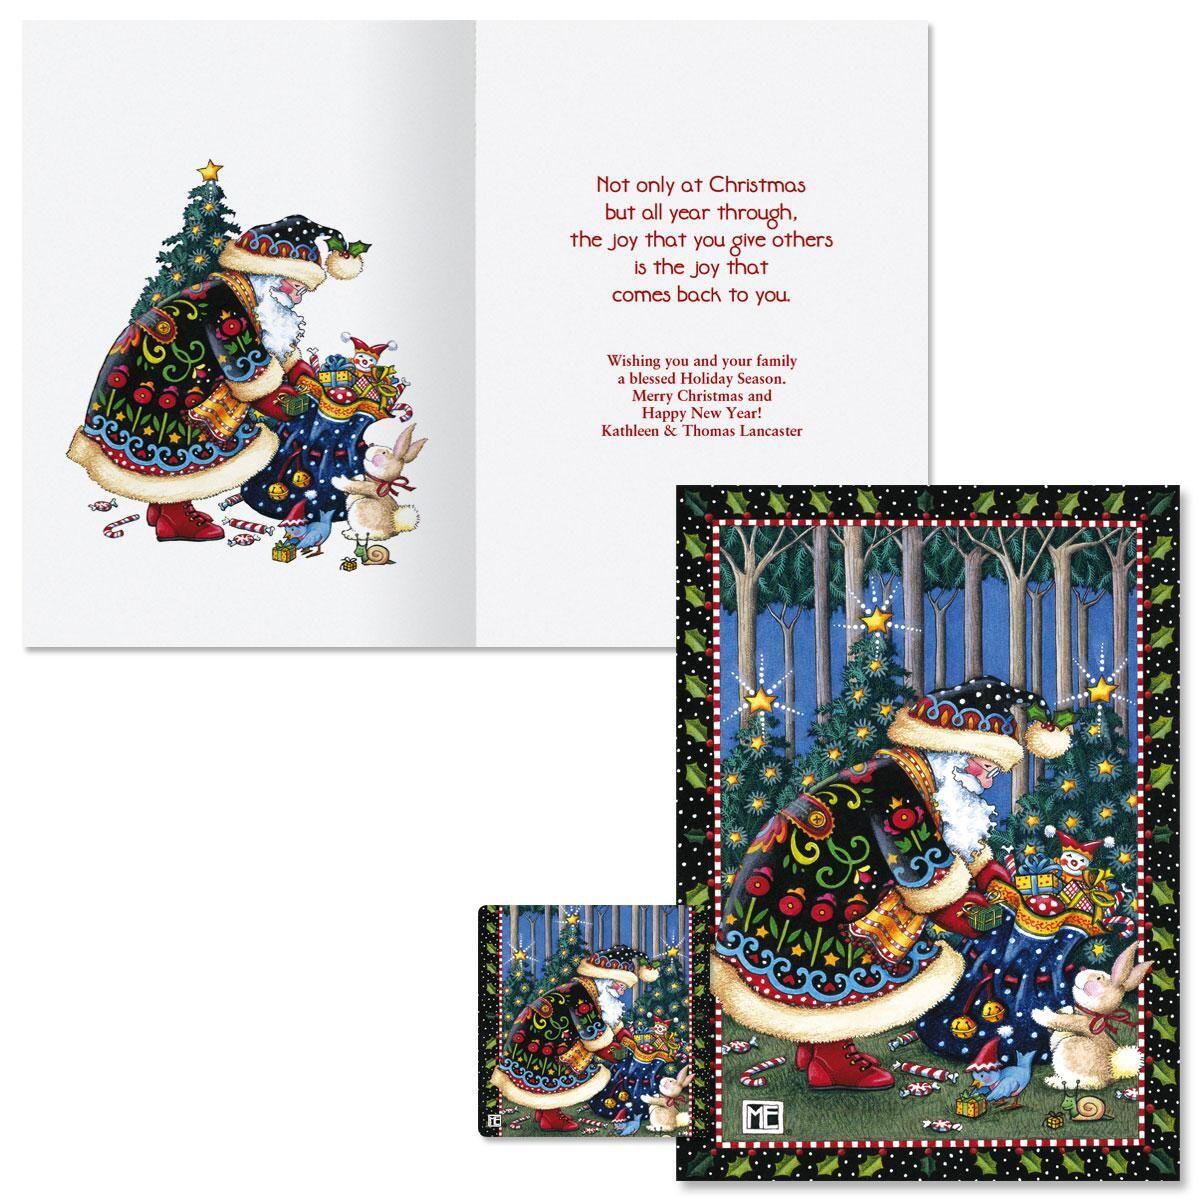 Mary's Woodland Christmas Cards